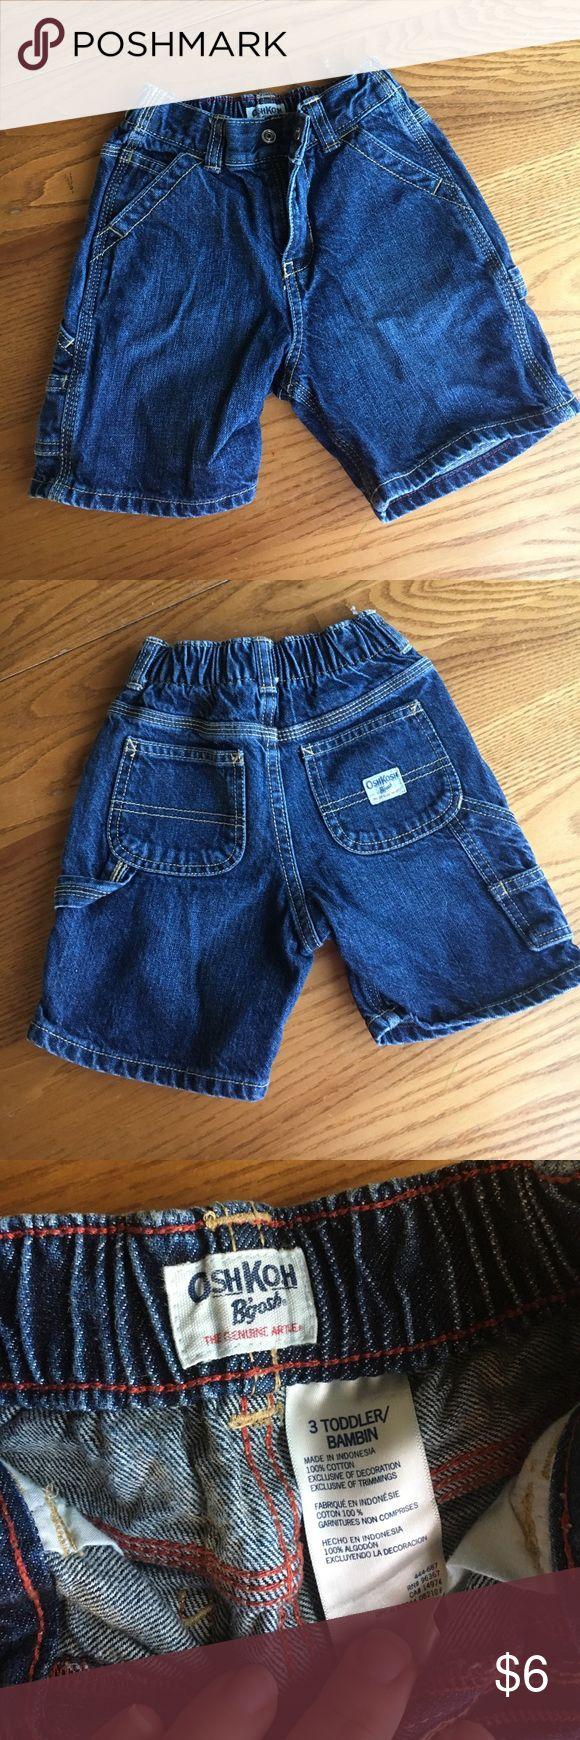 "🚨LAST CHANCE🚨 all kids items to B donated soon OshKosh B'gosh- Carpenter jean shorts- like new condition- 3T - elastic waist band with approx 2"" stretch 🎊15% off bundles 🎊 OshKosh B'gosh Bottoms Shorts"